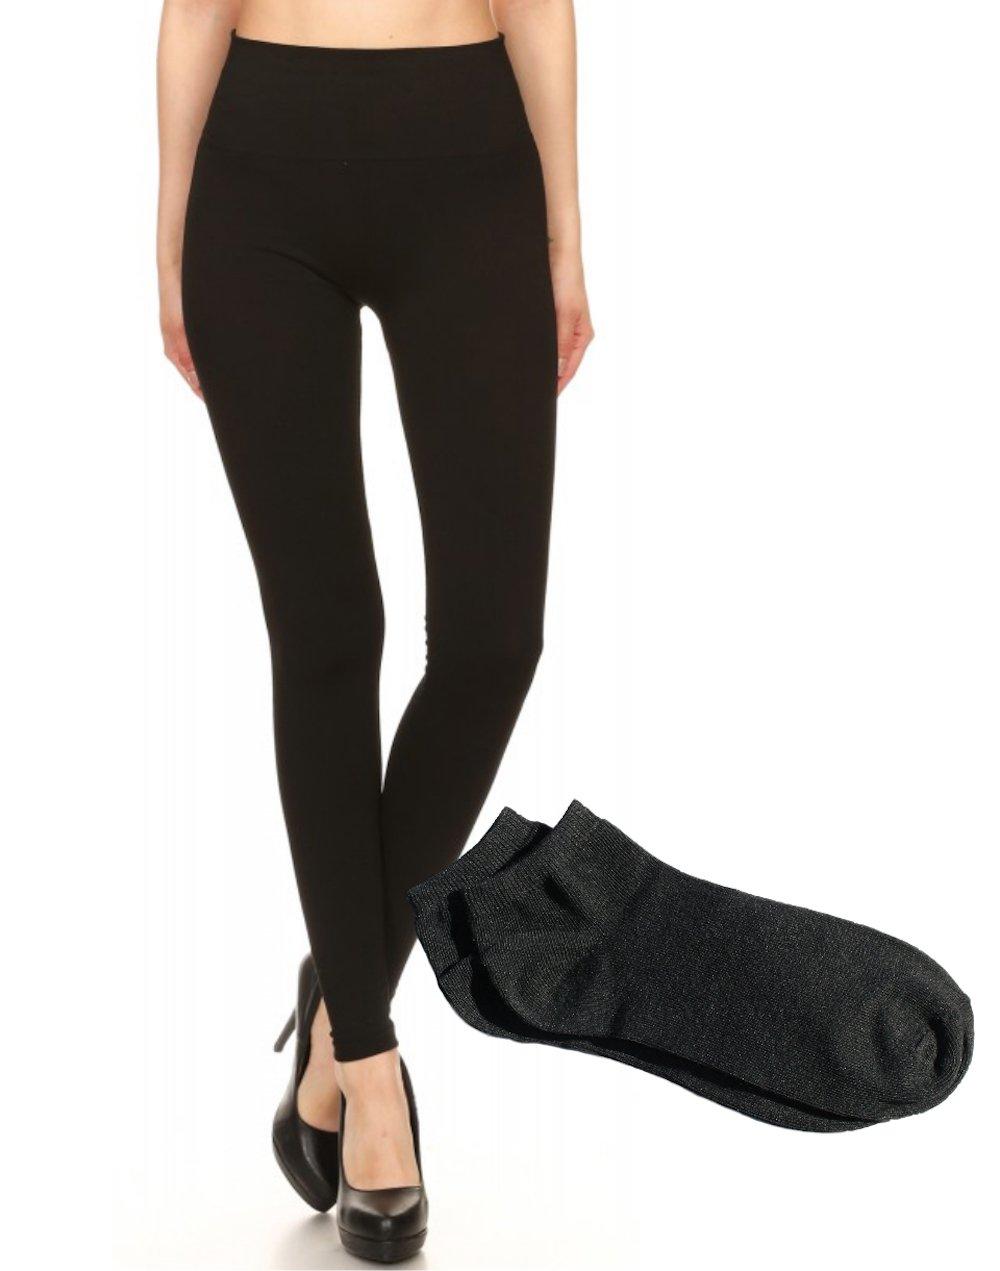 ShoSho Women's Sexy Everyday High Waisted Seamless Body Shaping Form Fitting Leggings w/FREE Socks (Black w/FREE Socks, S/M)